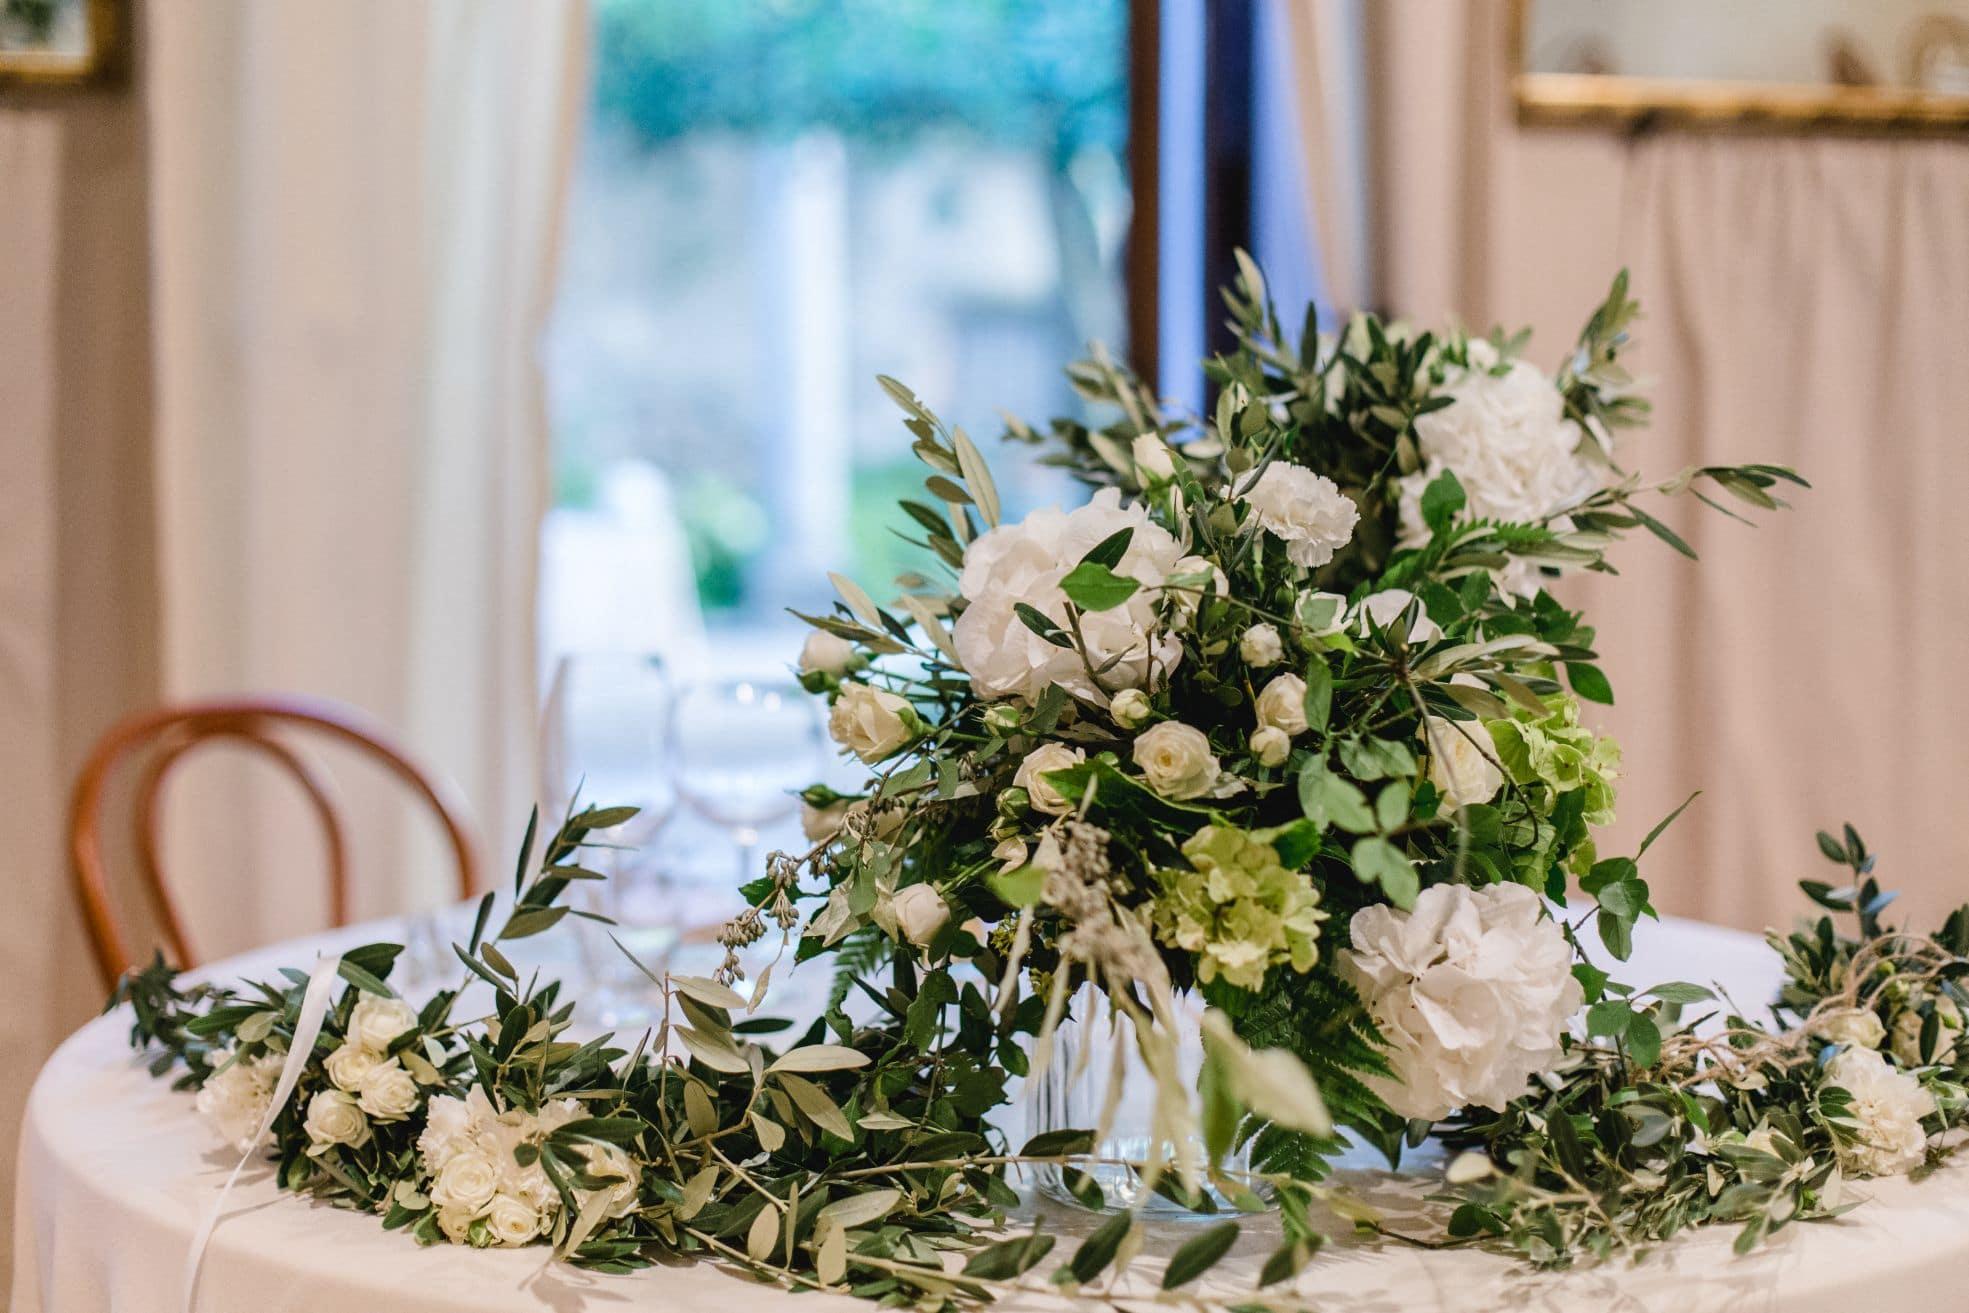 Million Memories_A&D_Hochzeitsfotograf_Schlosshochzeit_Toskana_Lago Di Como_Wedding_Tuscany_169